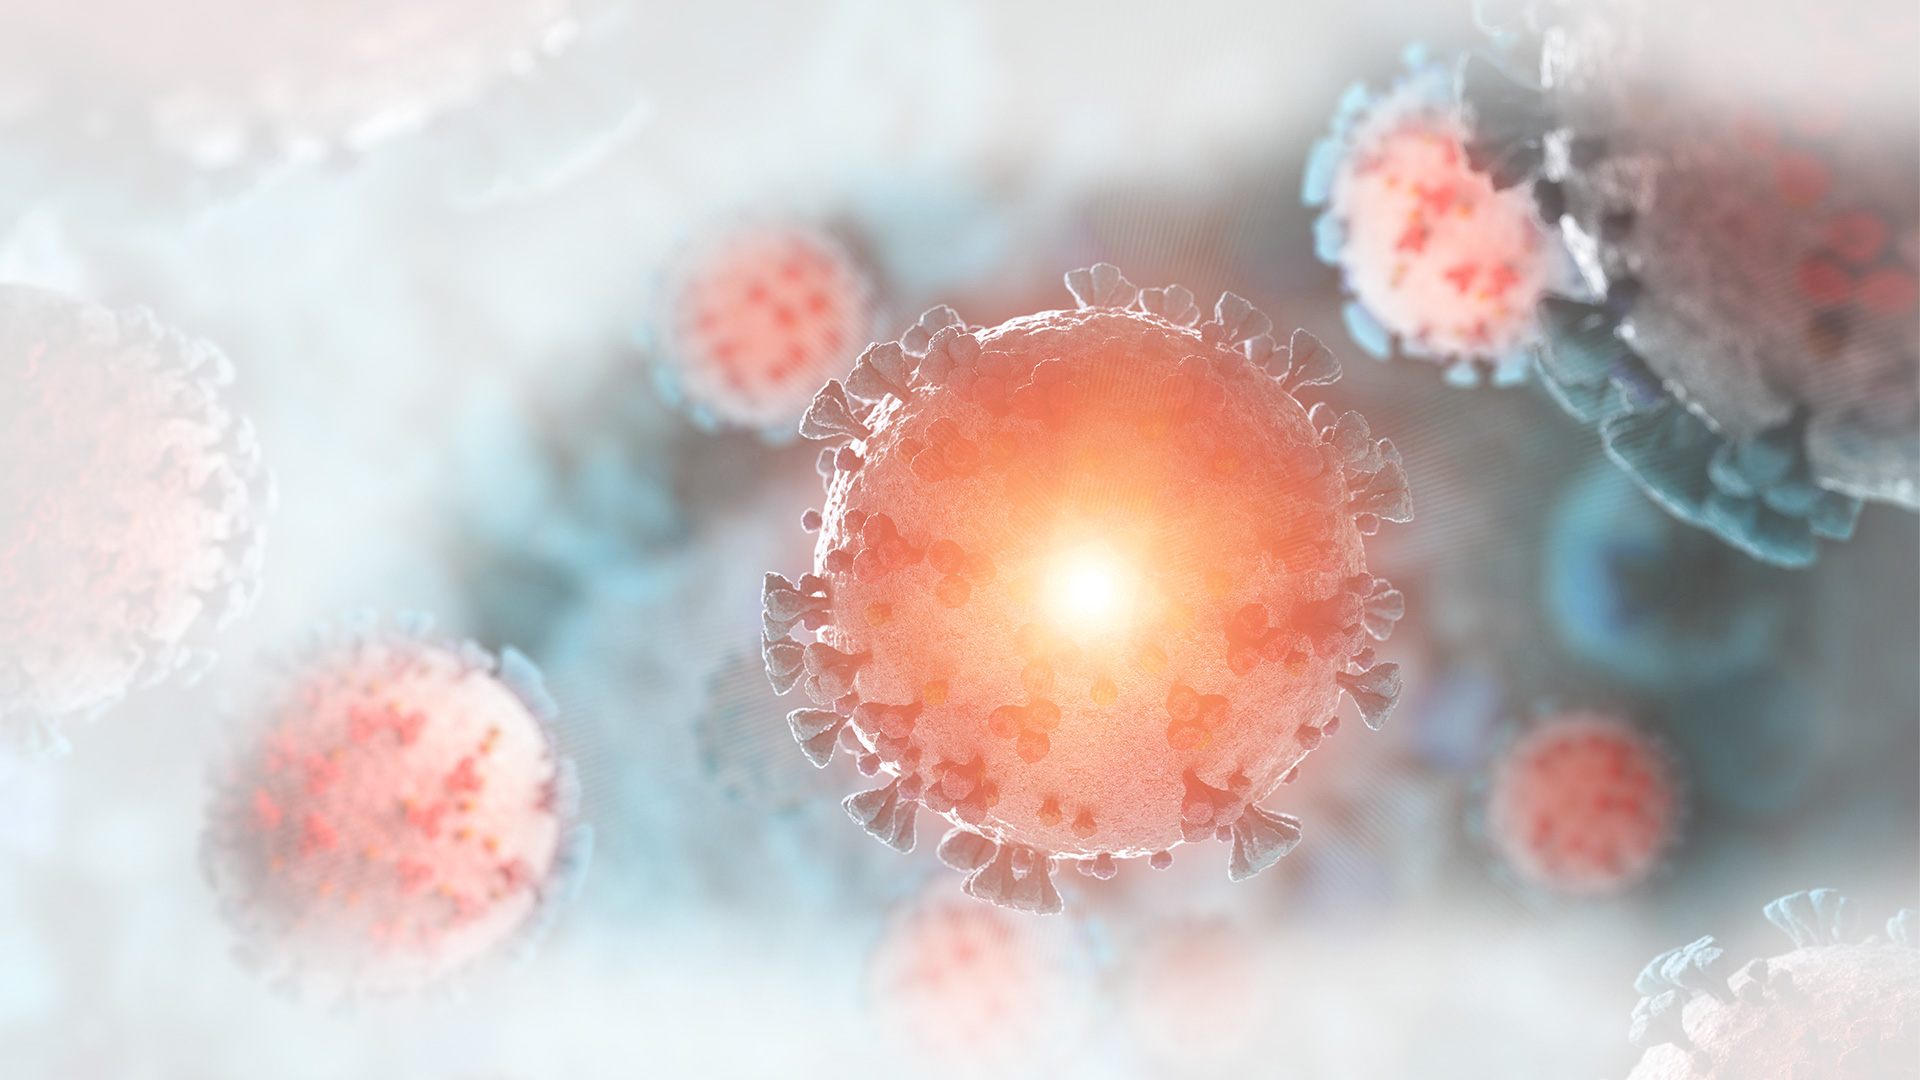 Blue and orange illustration of diseased virus infected tissue floating